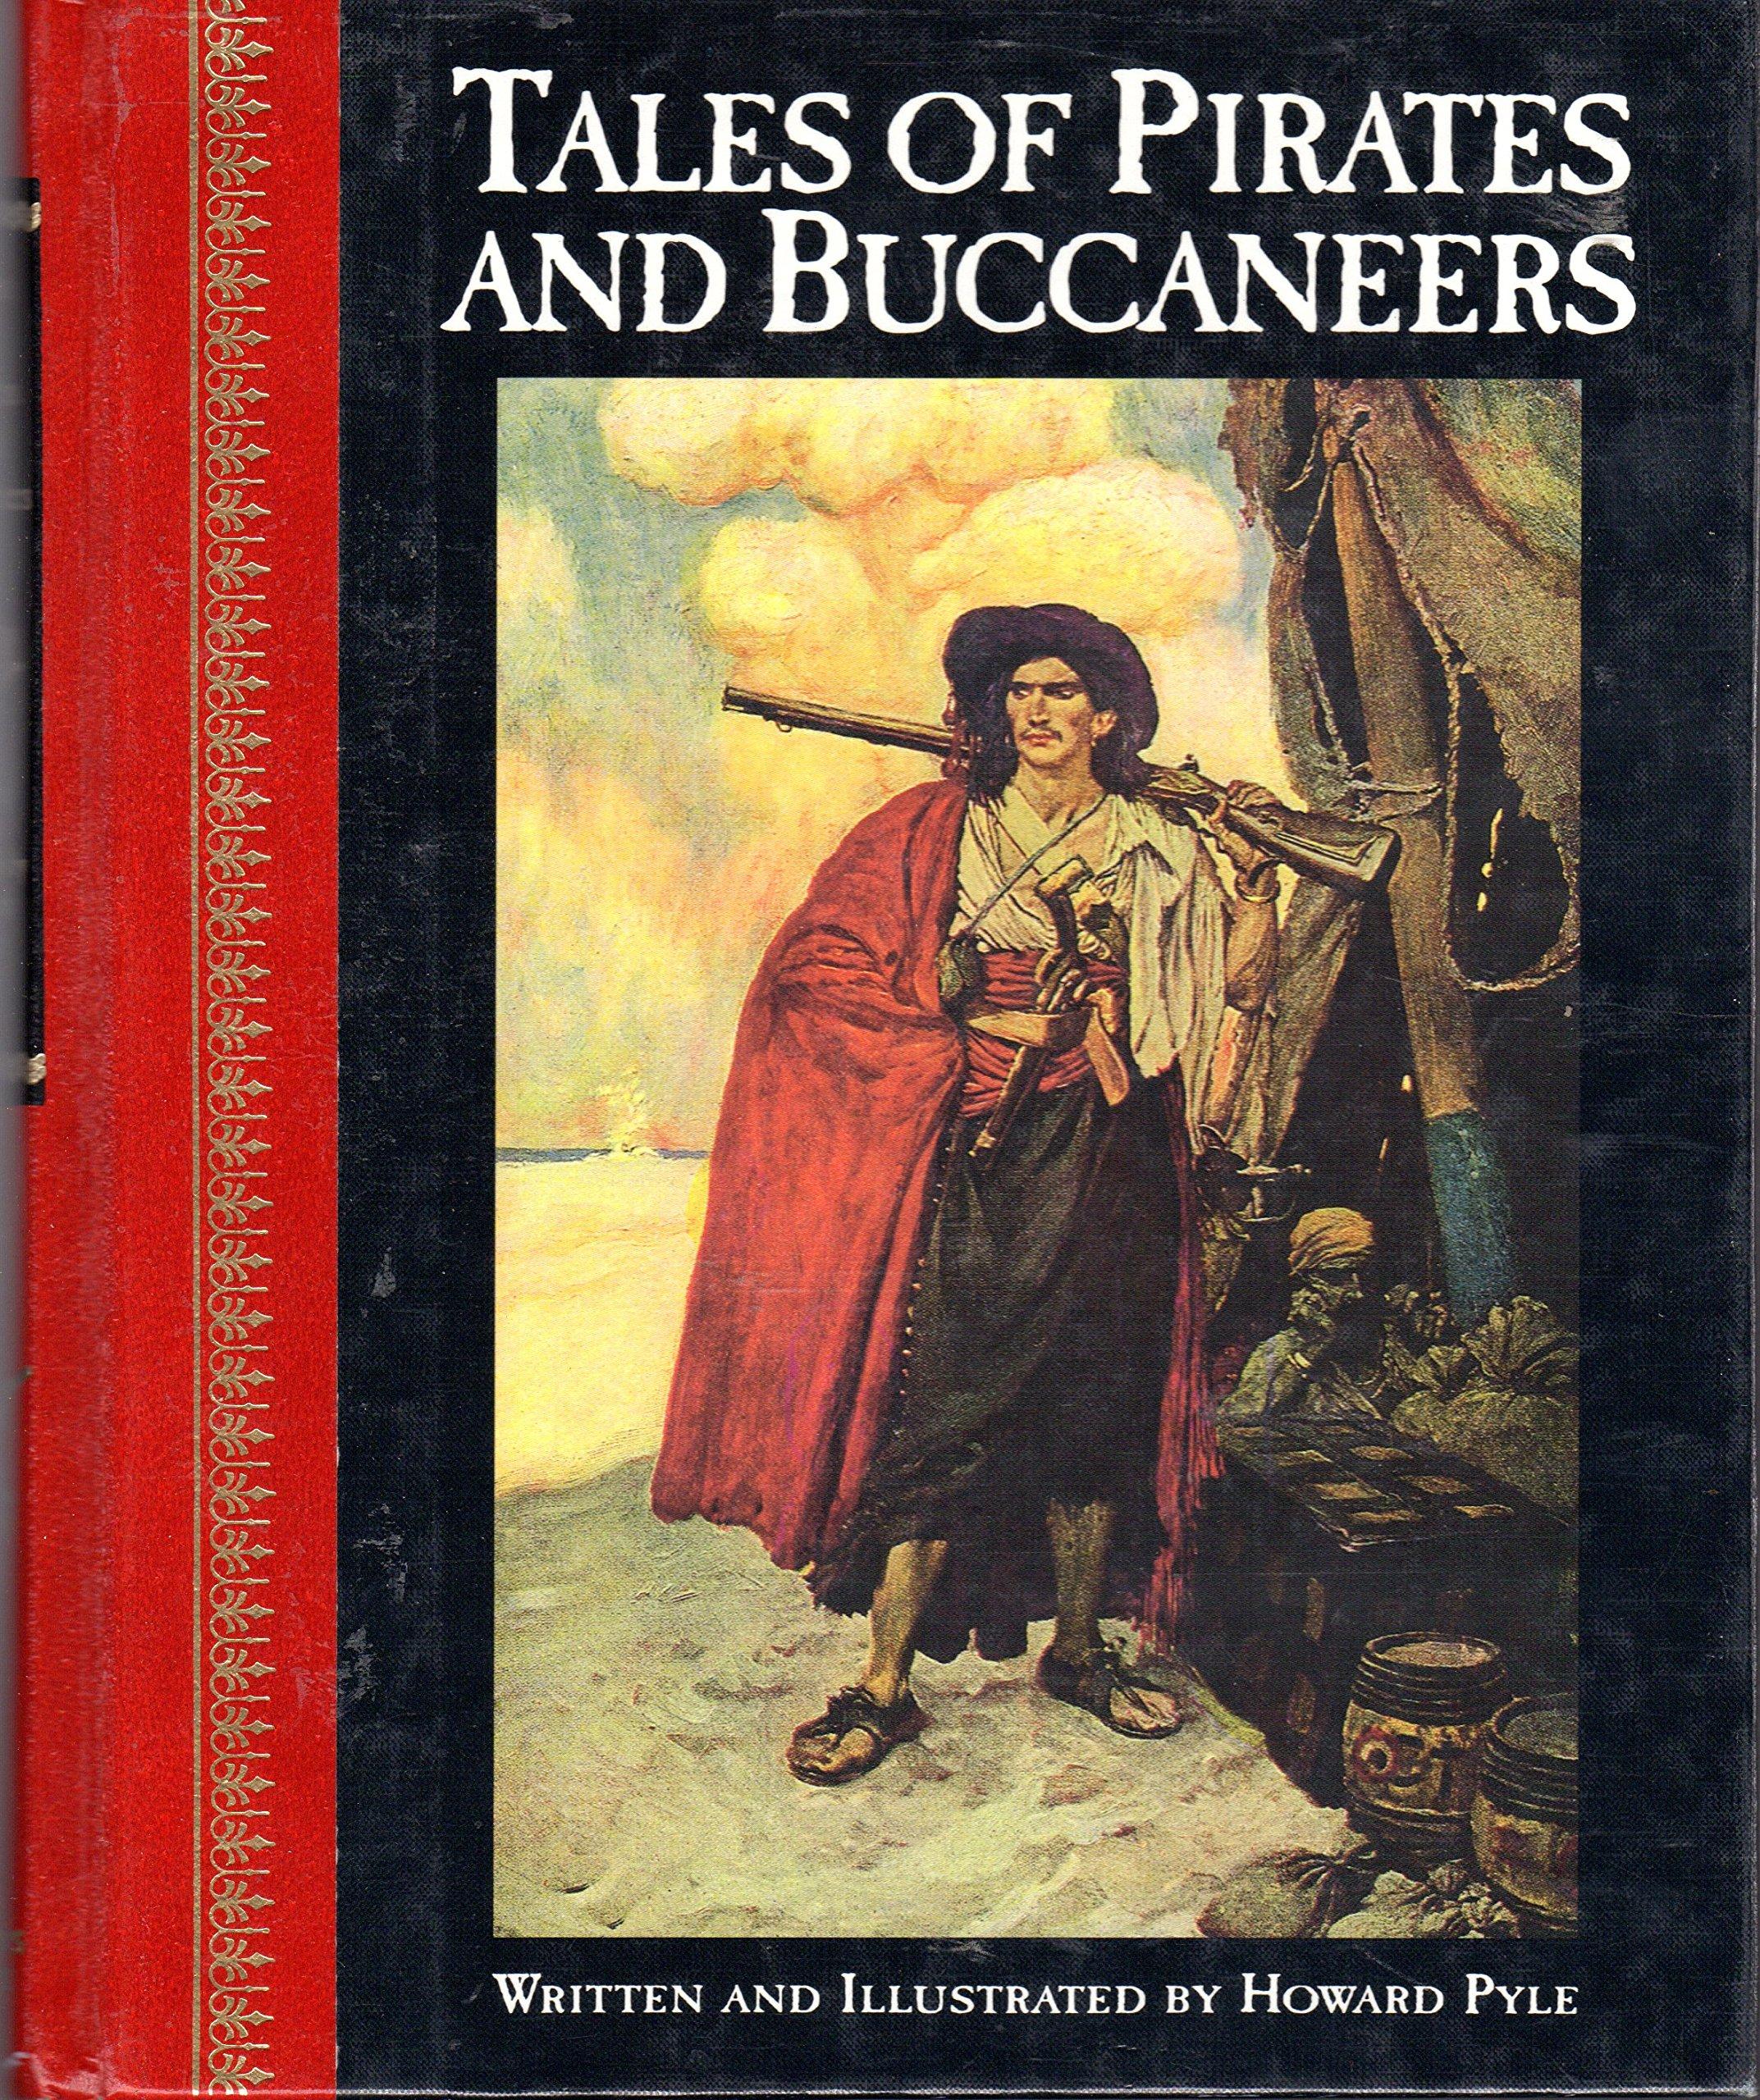 tales of pirates buccaneers children s classics pyle howard 9780517101629 amazon com books tales of pirates buccaneers children